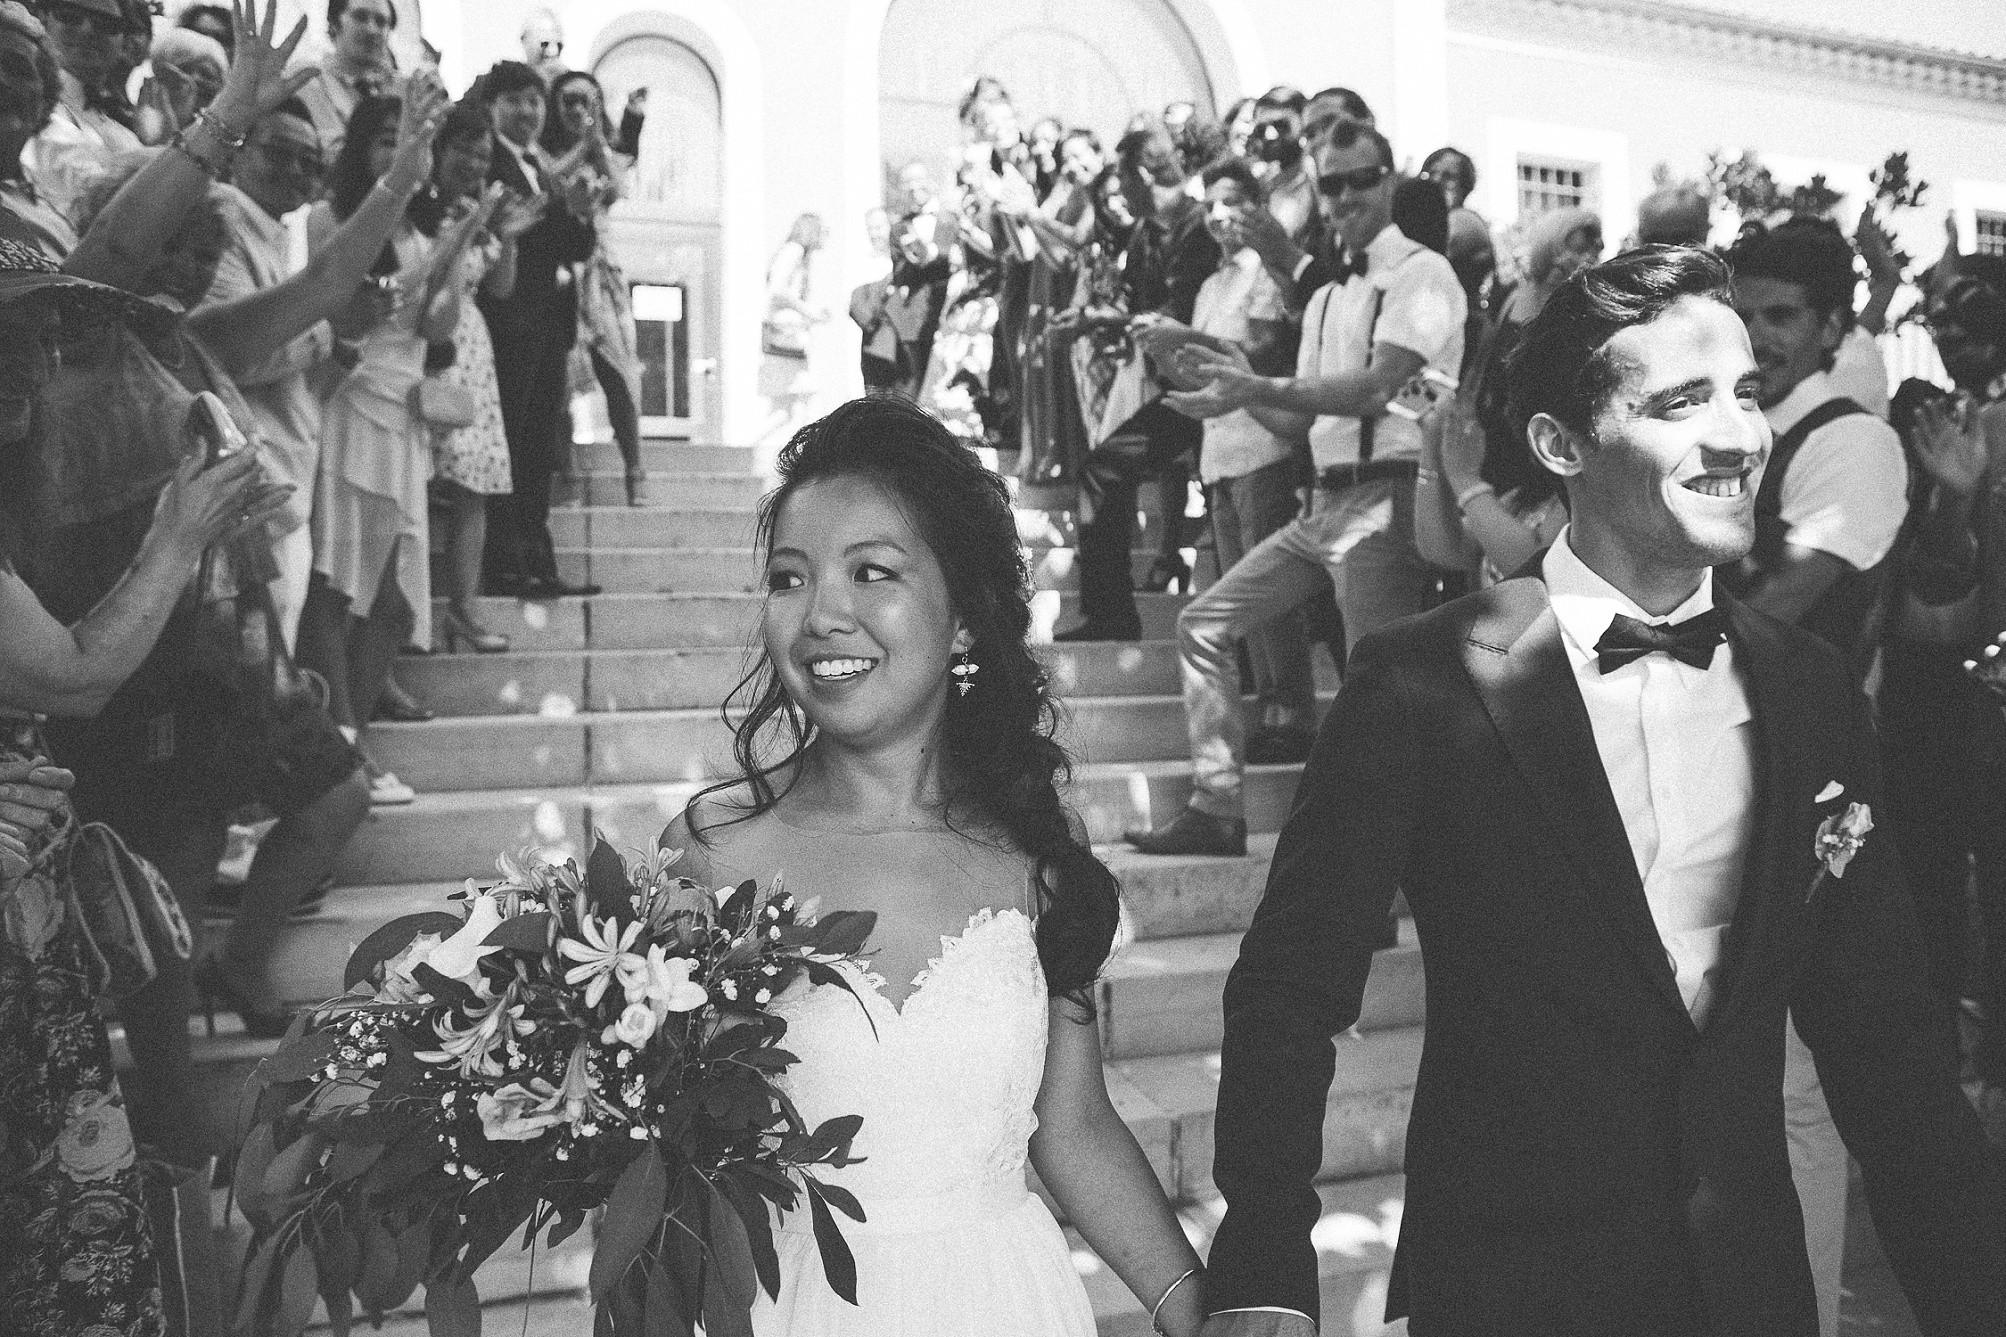 katerynaphotos-mariage-photographe-puyloubier-provence-aix-en-provence-sud-de-la-france_0367.jpg